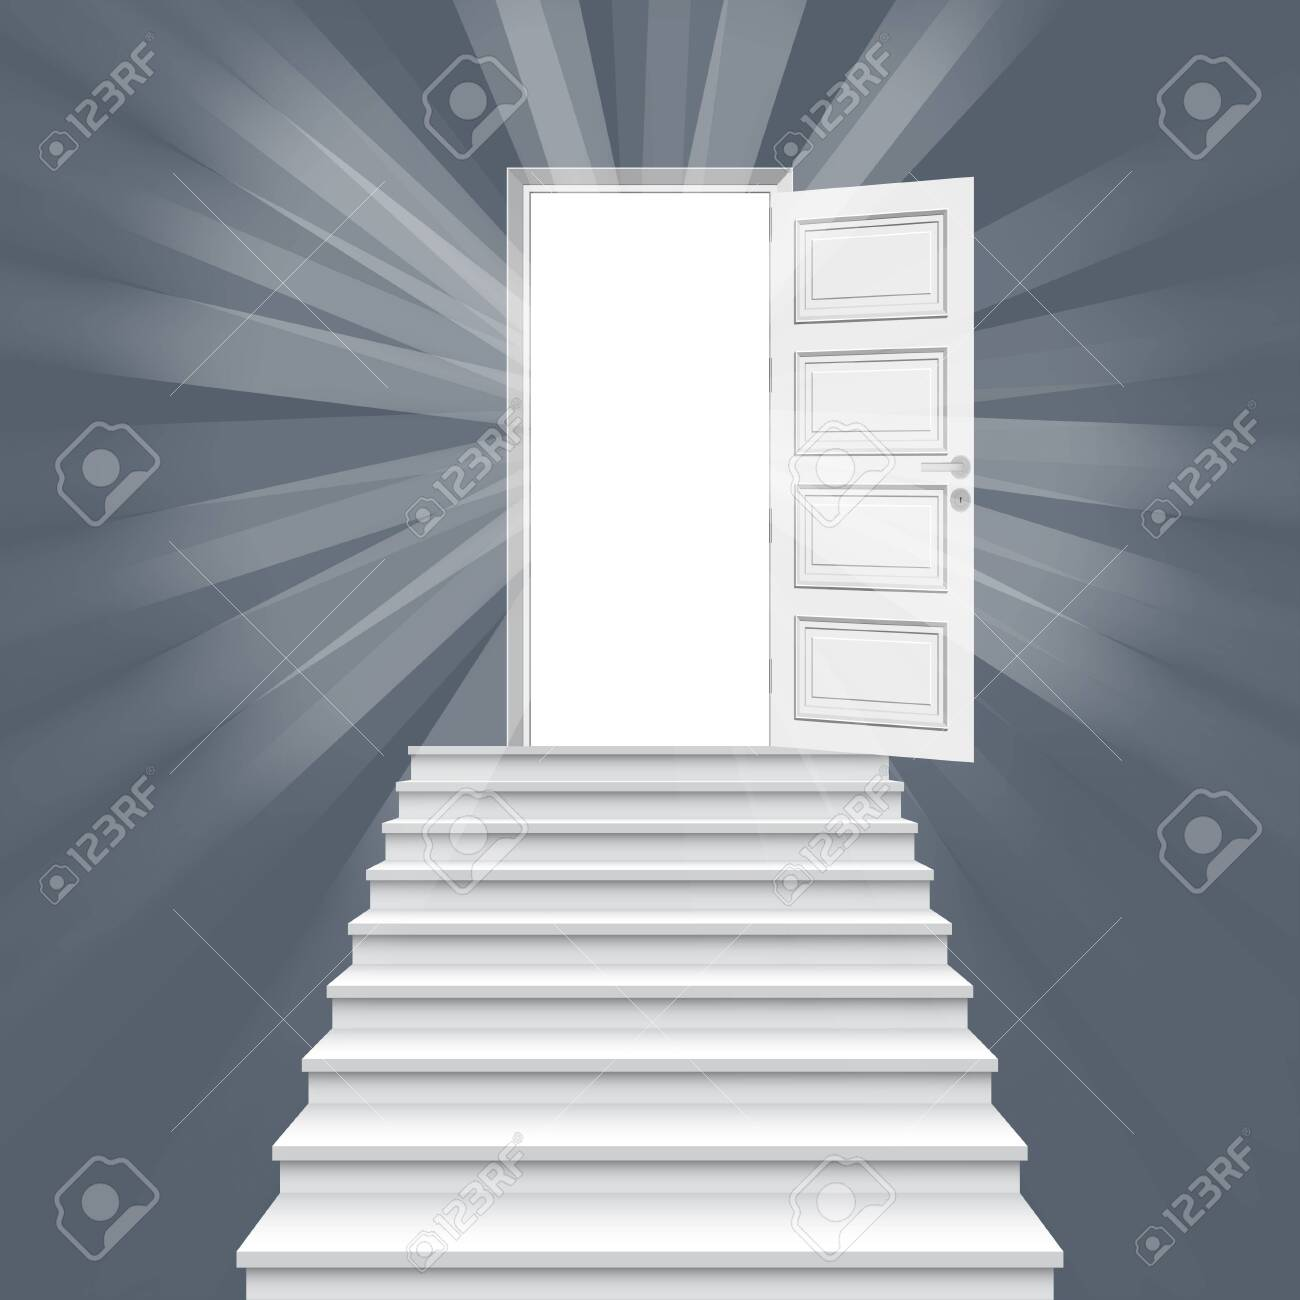 Straight stairway leading to open door vector illustration. - 121083978